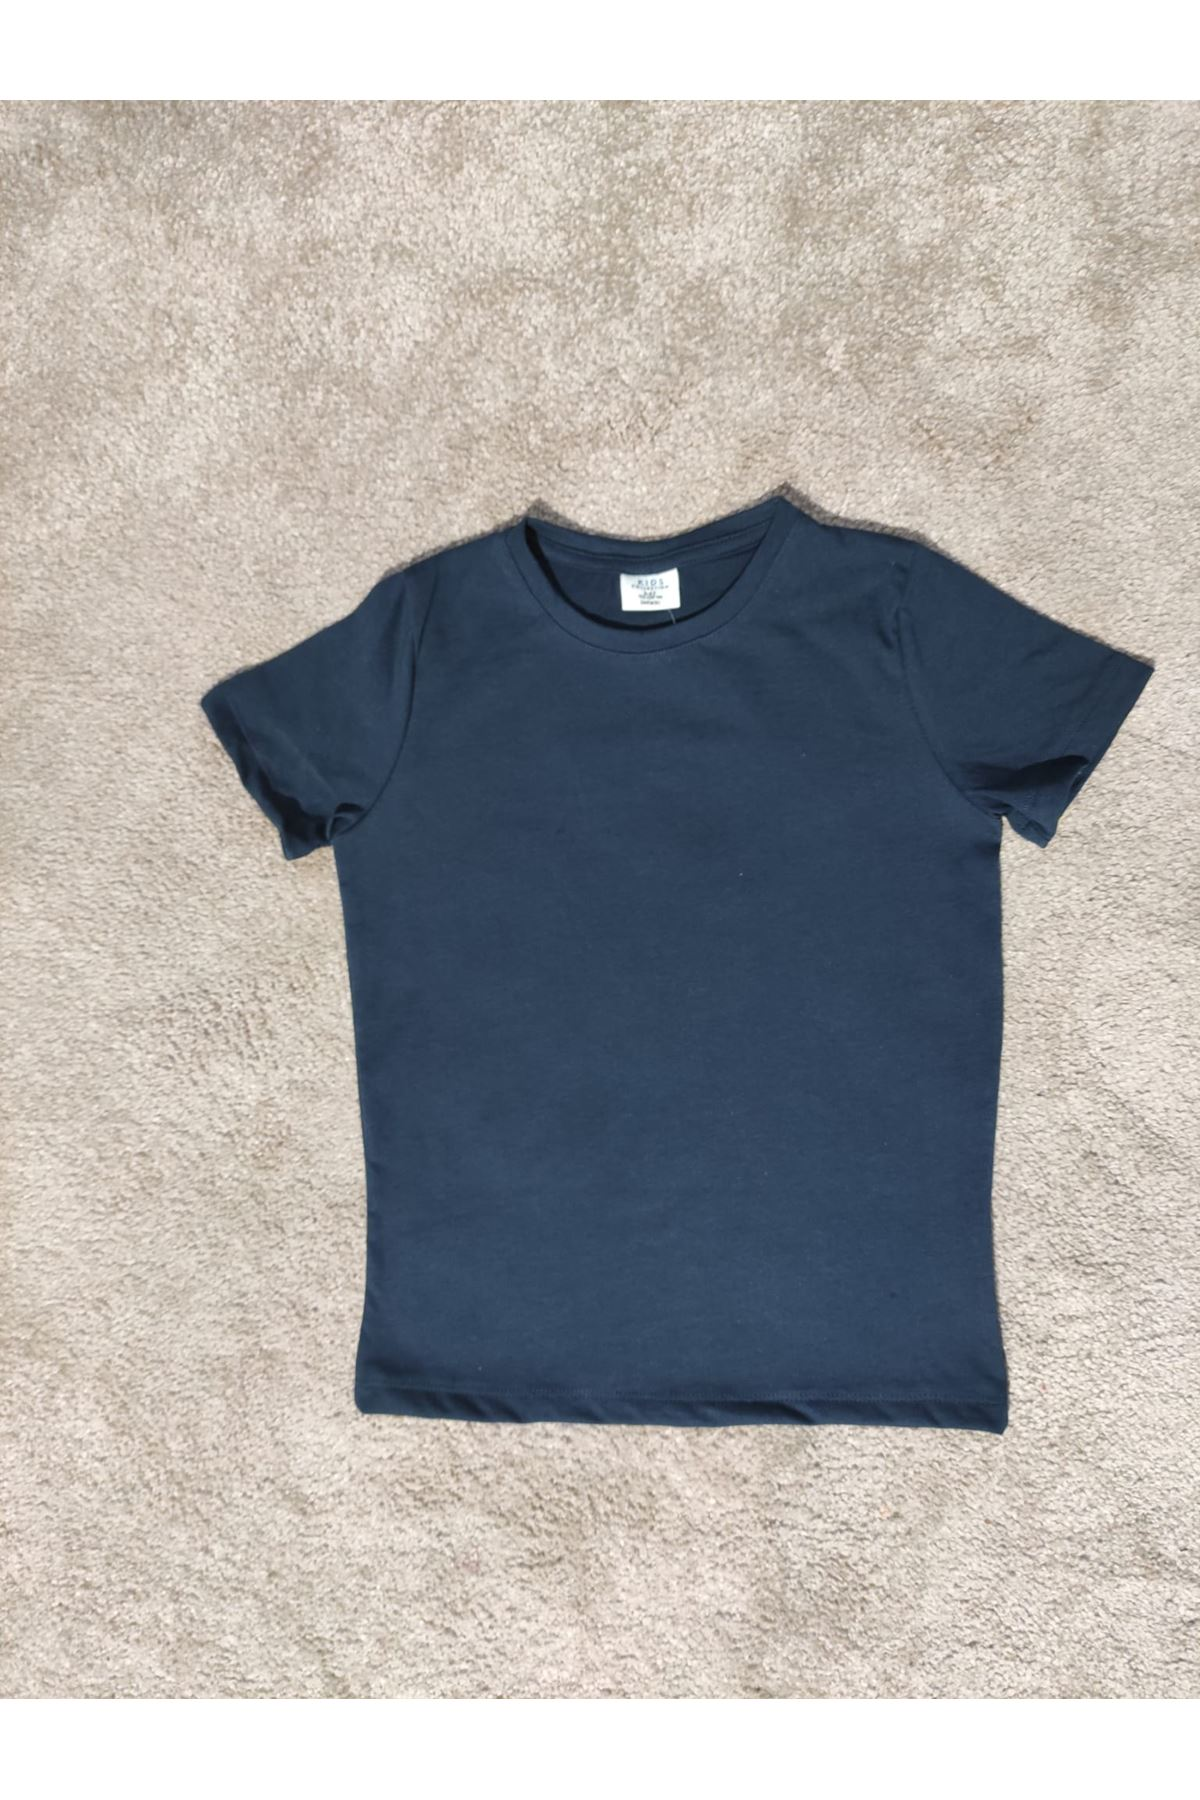 Kız Çocuk Bisiklet Yaka Lacivert T-shirt